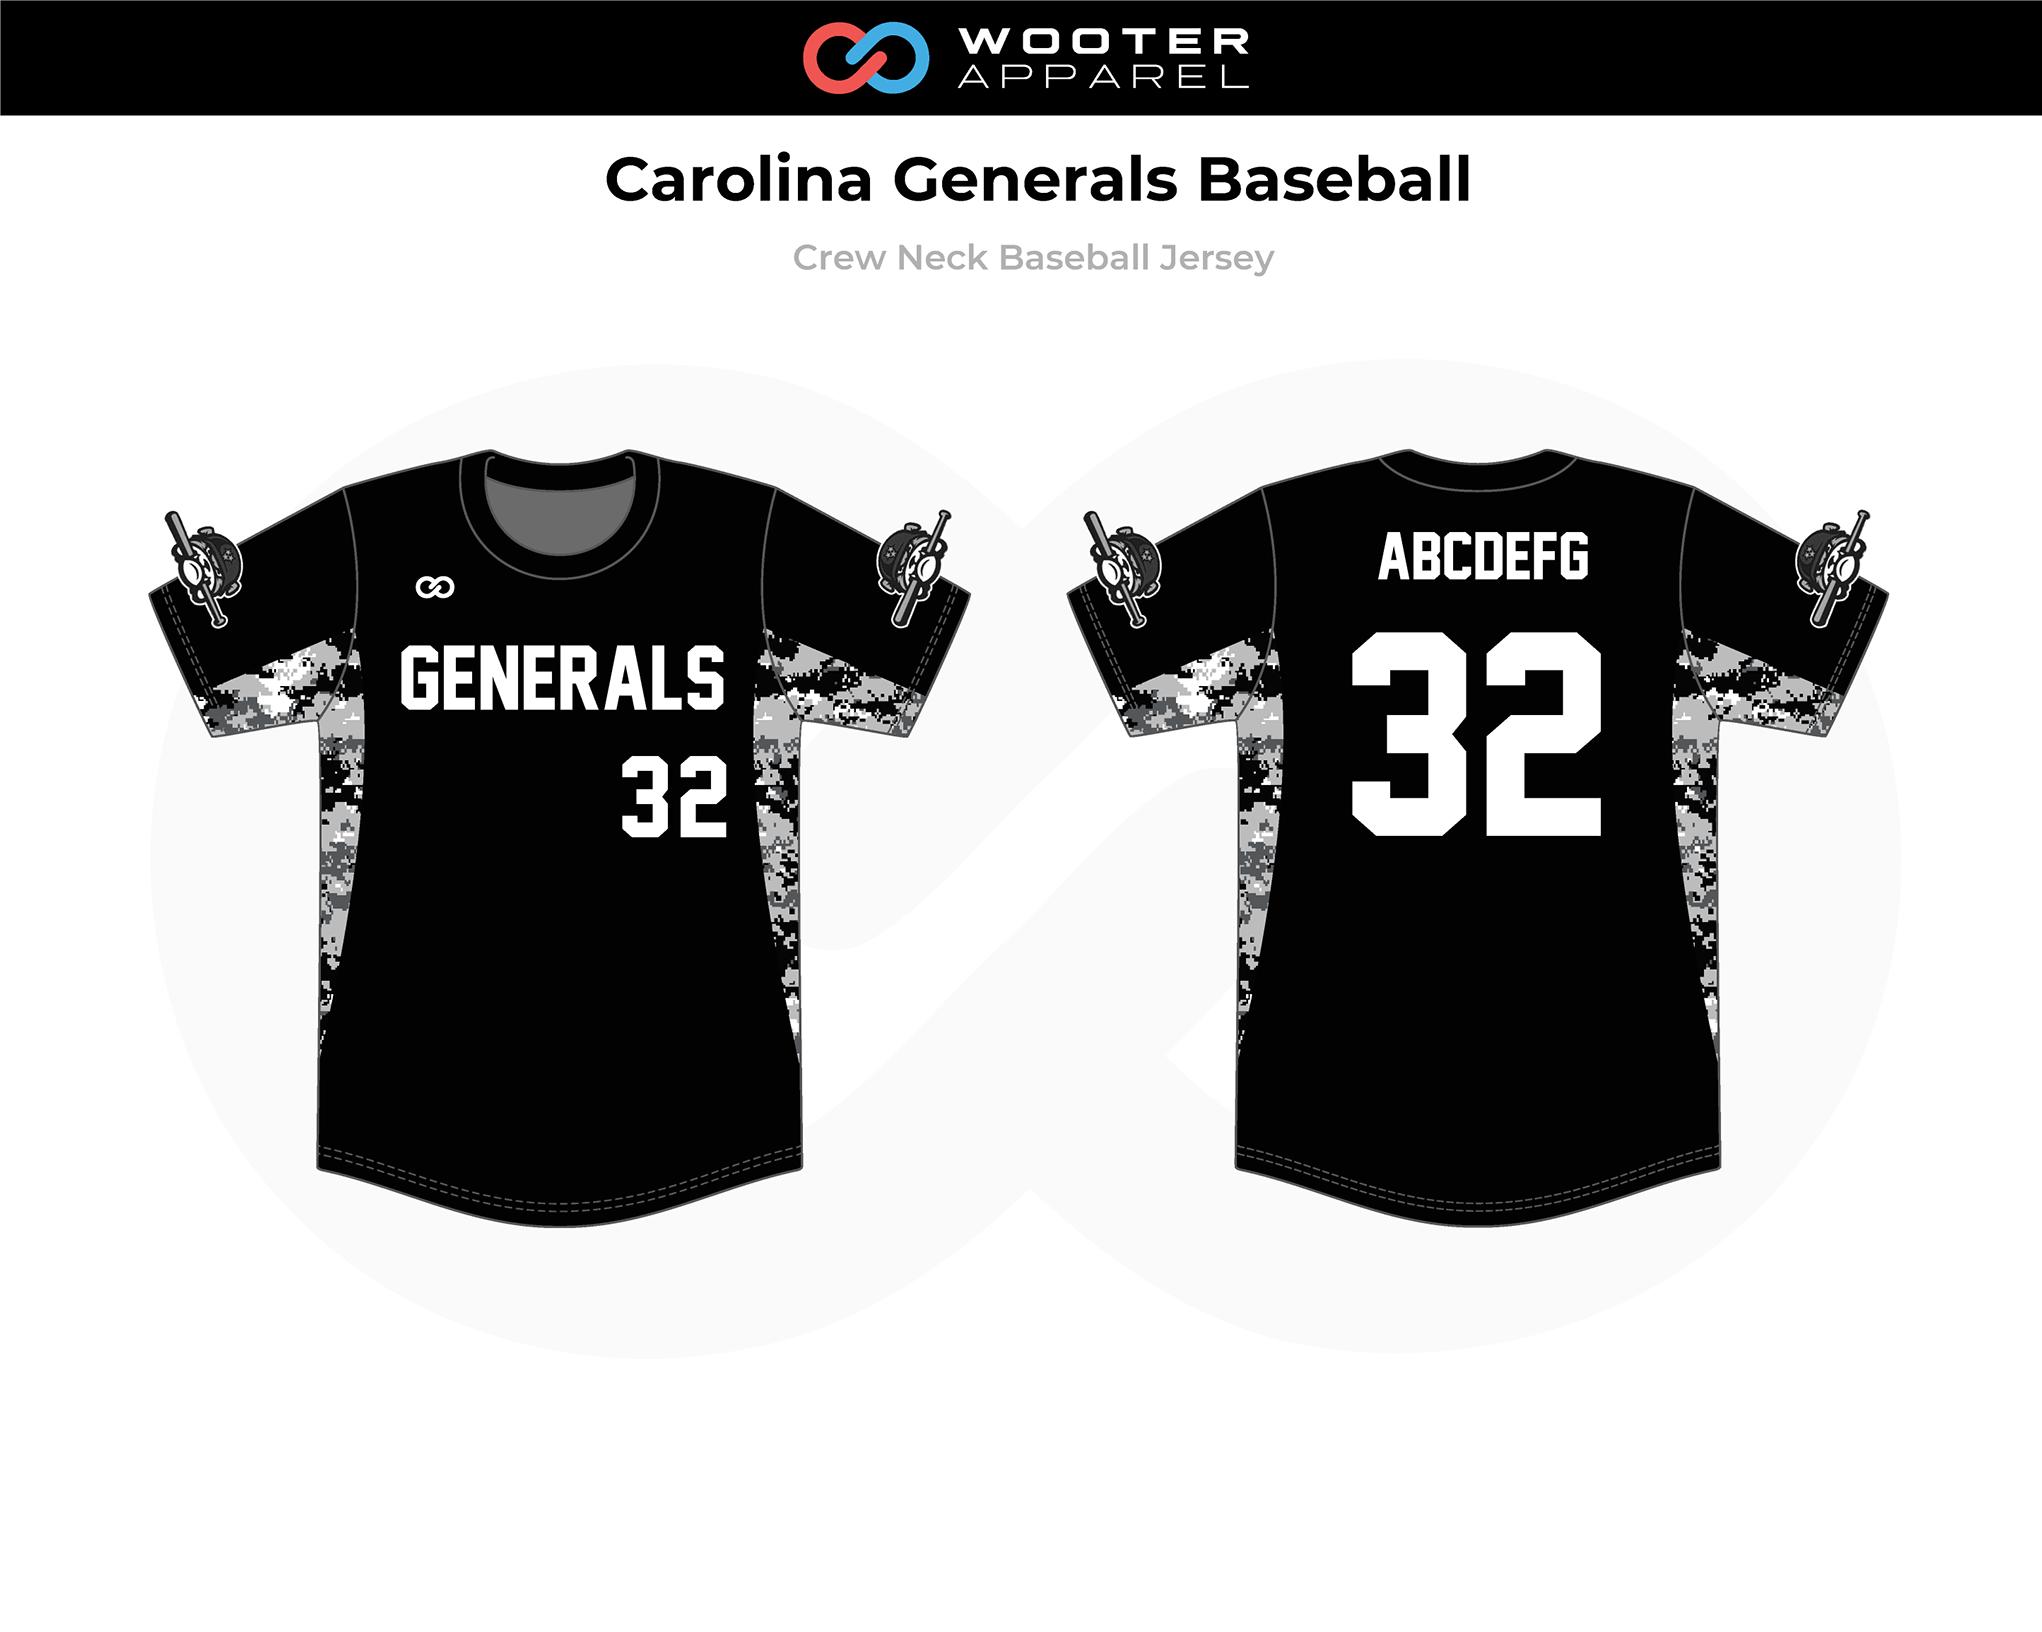 2018-01-10 Carolina Generals Baseball Crew-Neck Pullover Jersey (Black).png